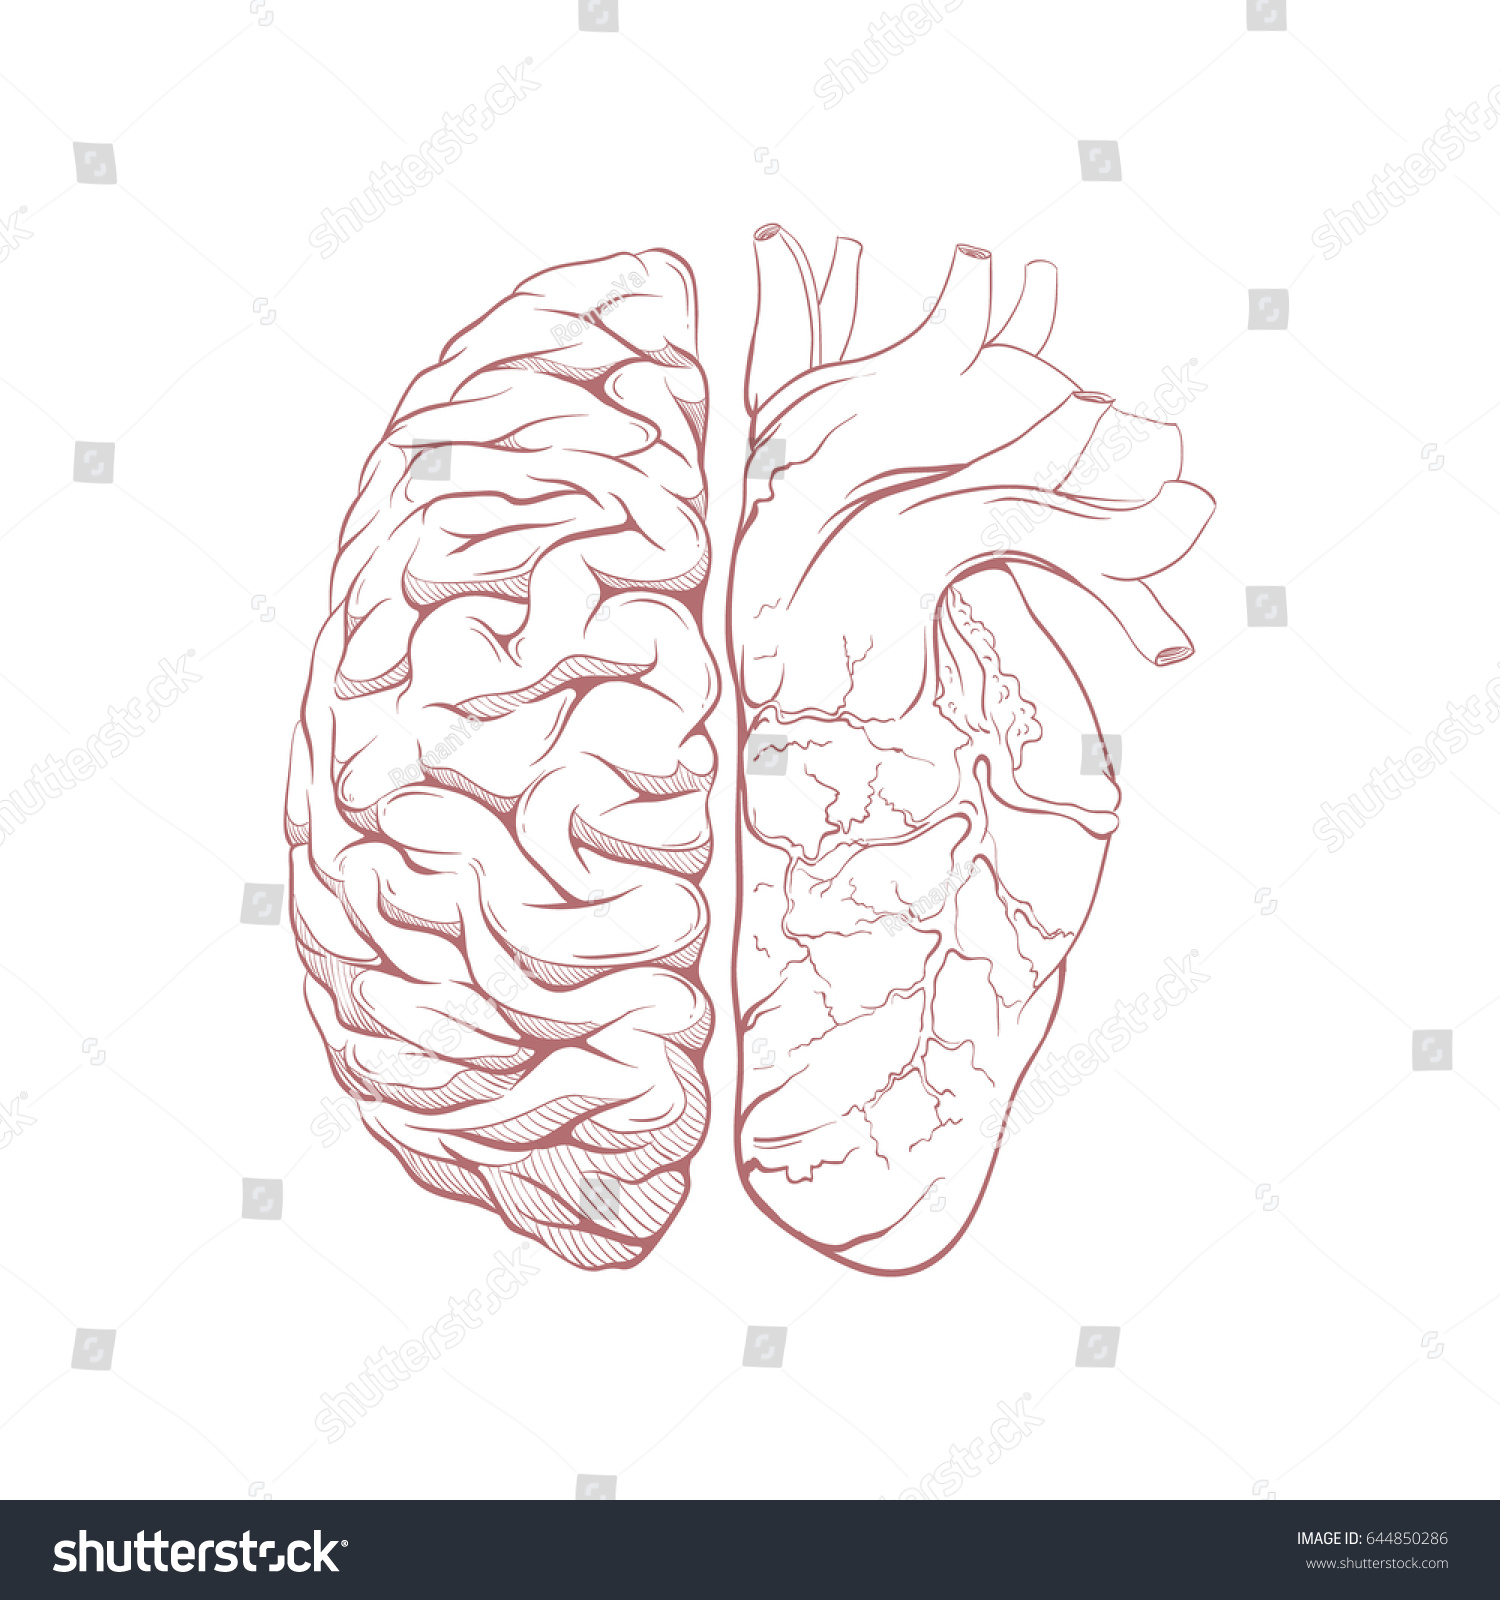 Versus human brain right and left hemisphere and heart illustration ...